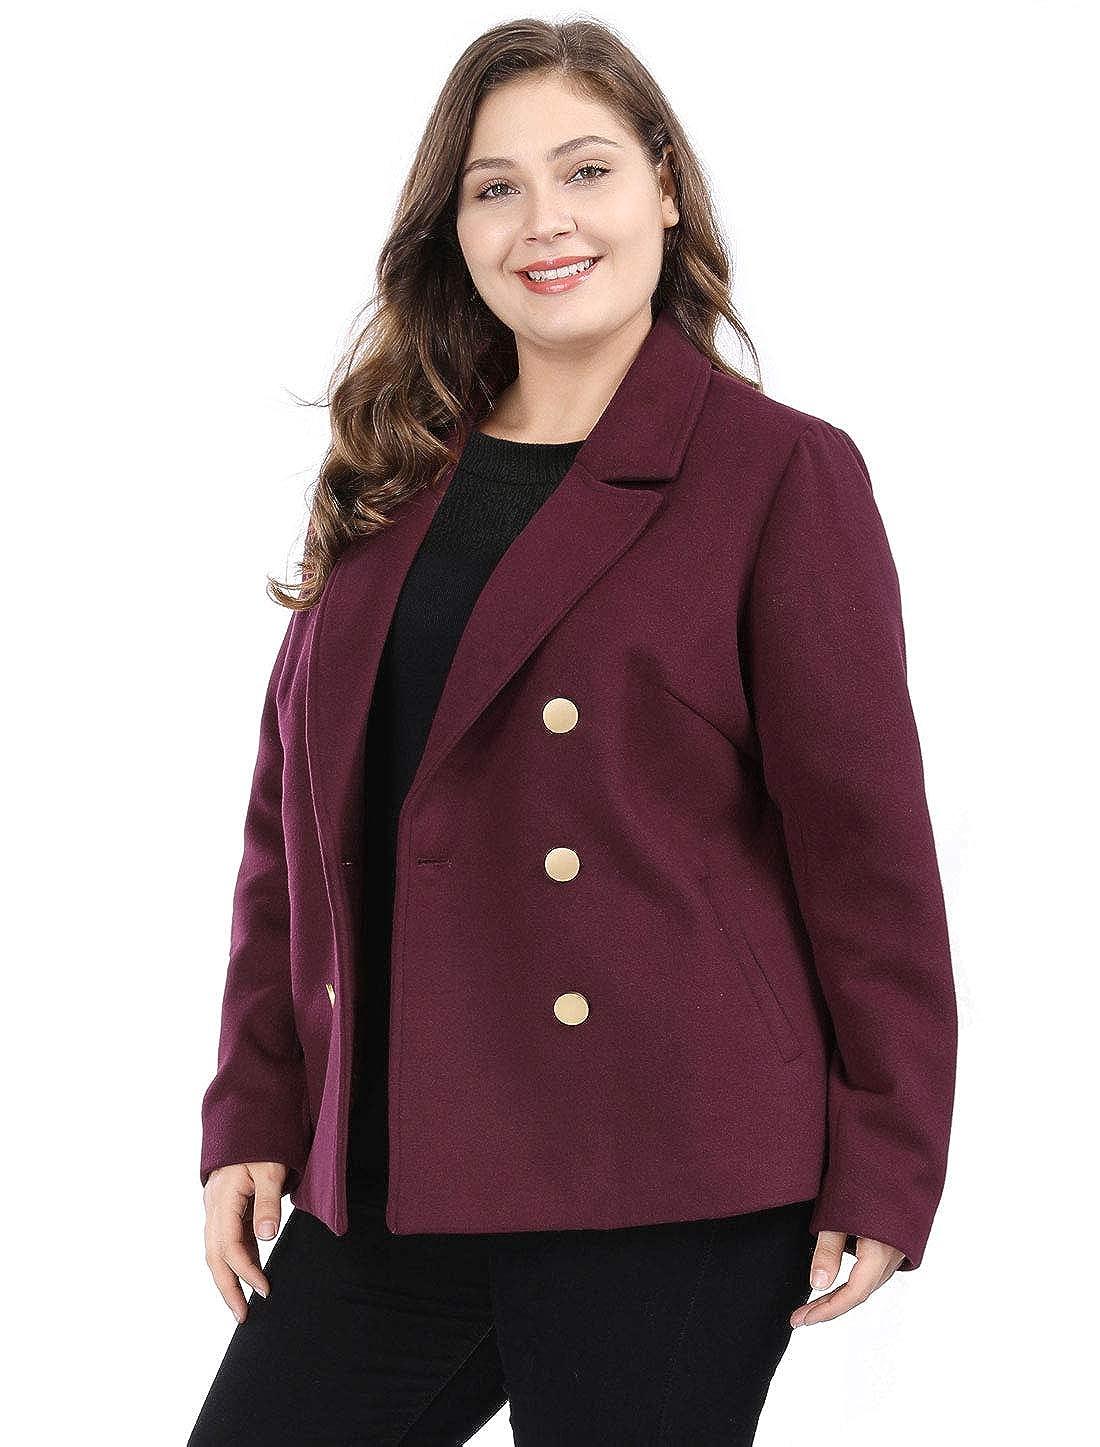 50f596b85d769 Amazon.com  Agnes Orinda Women s Plus Size Double Breasted Winter Peacoat Notched  Lapel Coat  Clothing